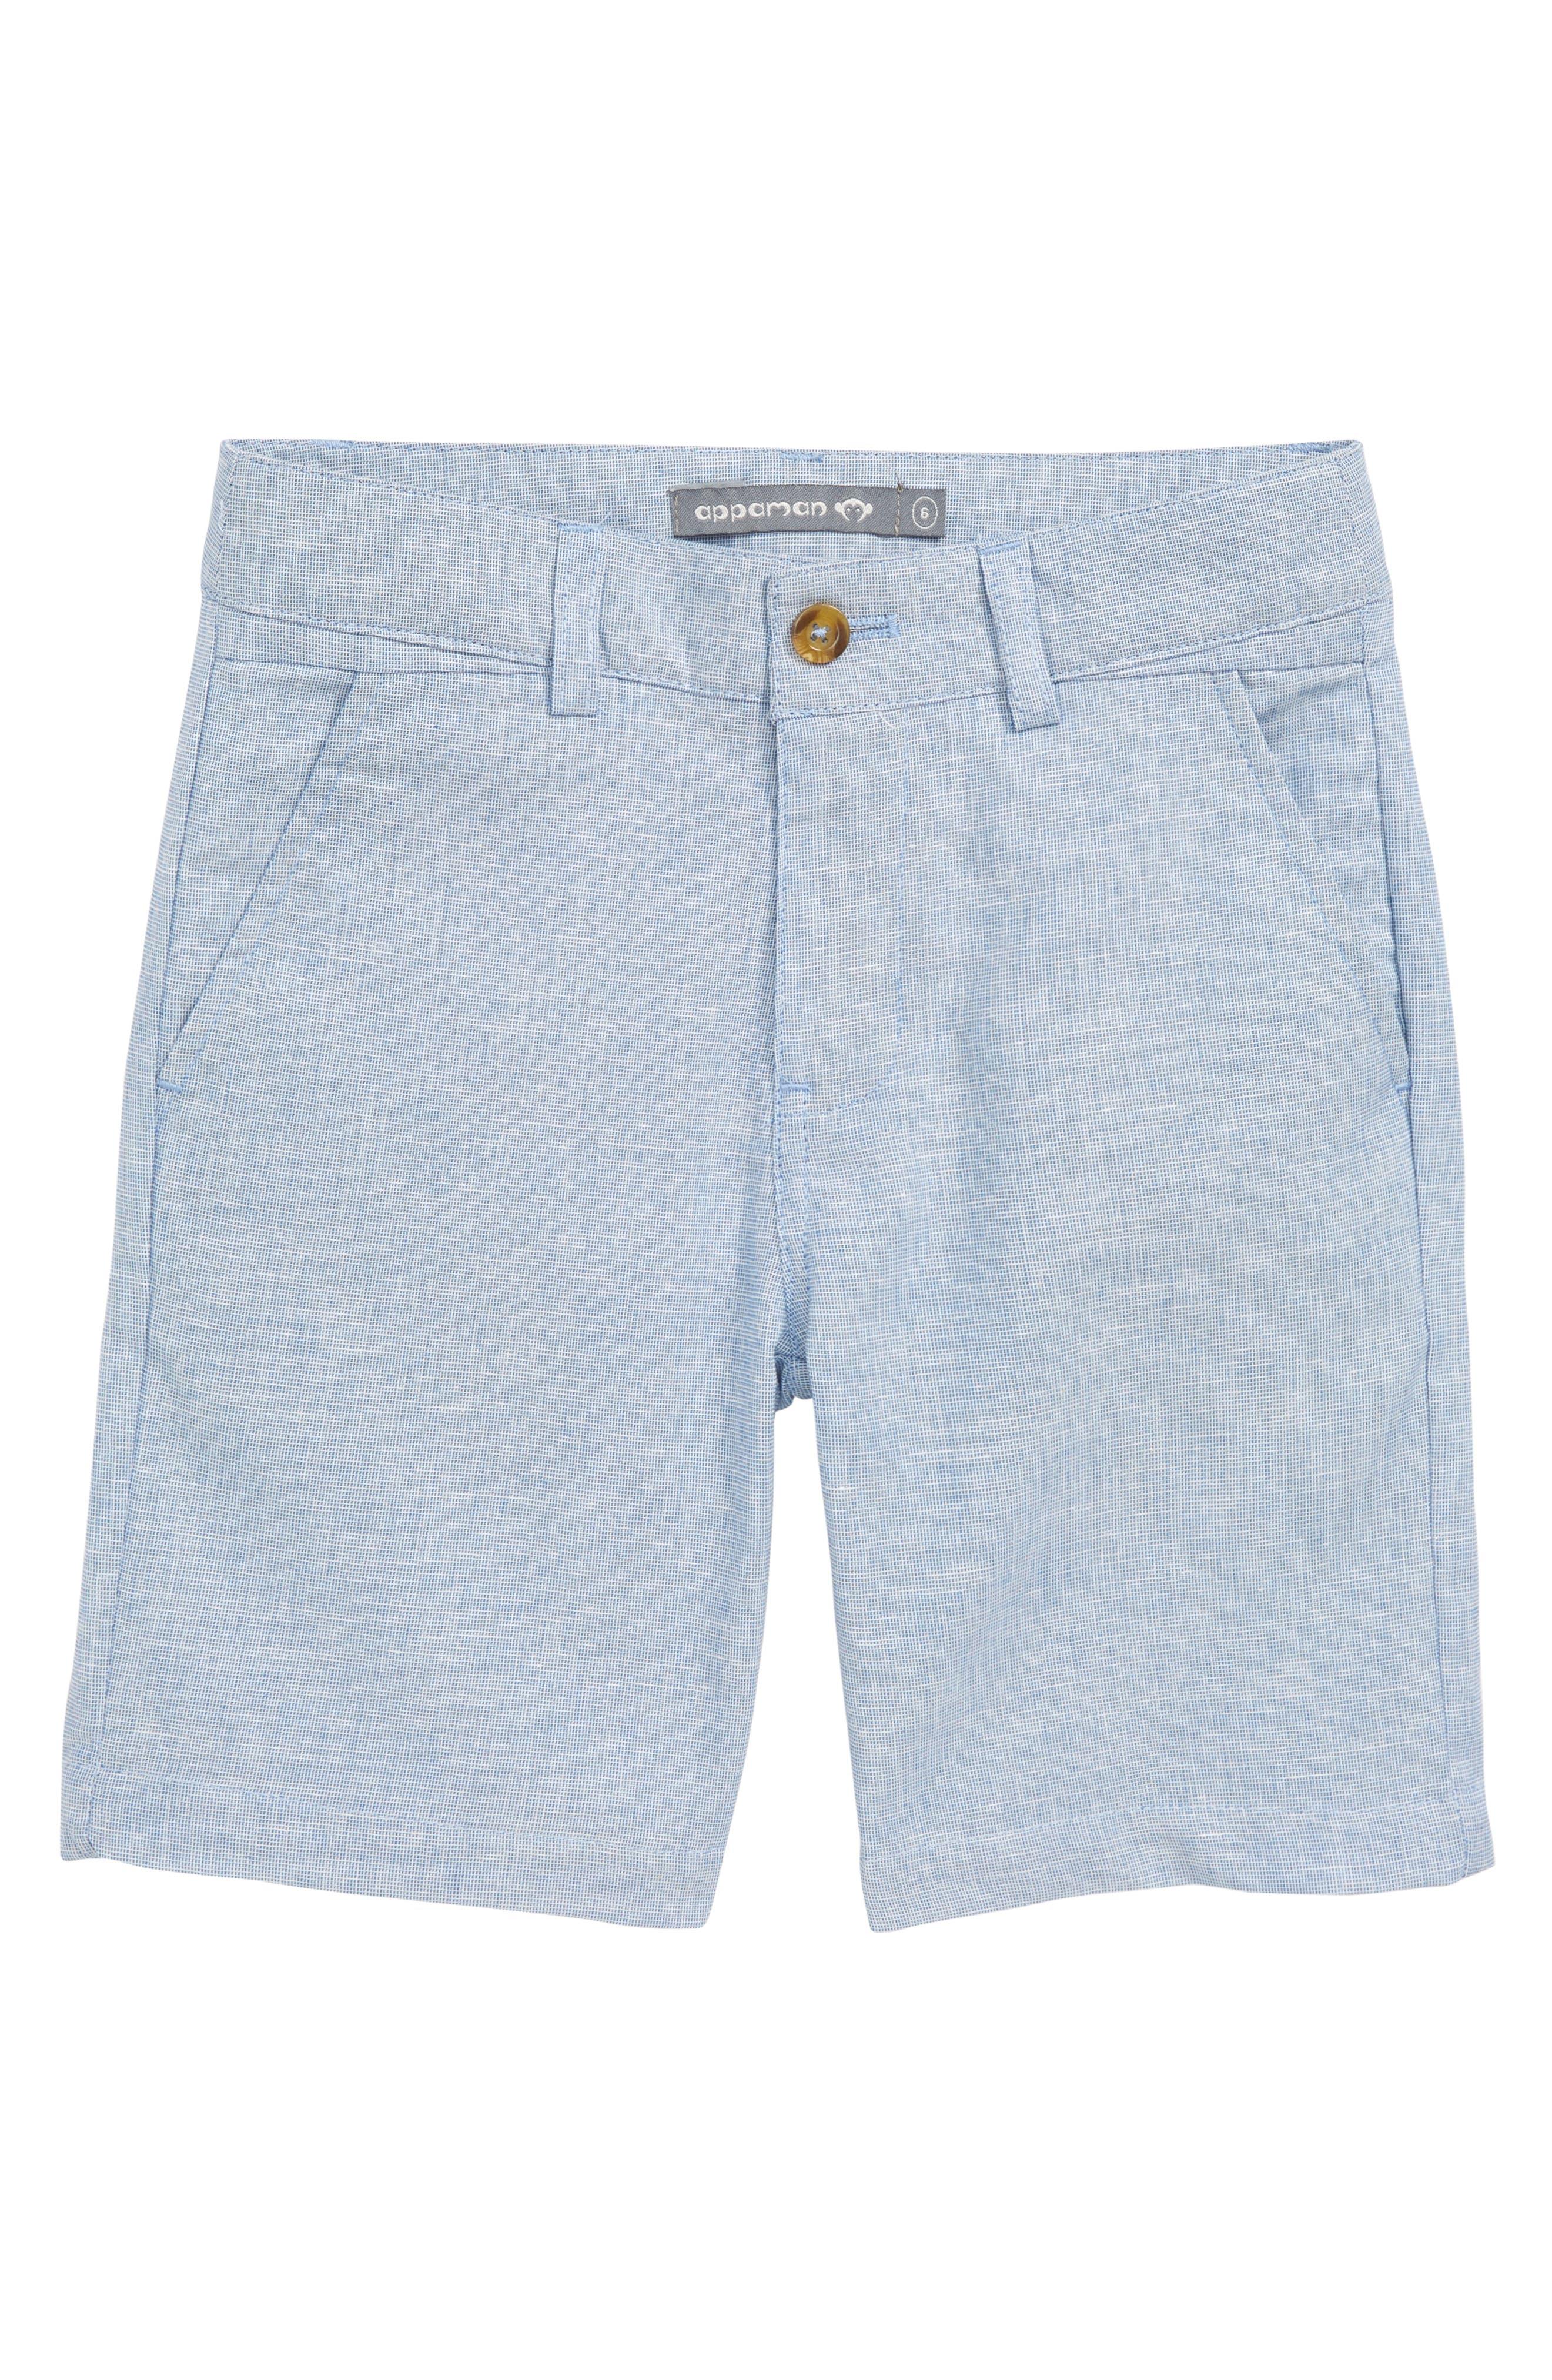 Trouser Shorts,                         Main,                         color, Sky Club